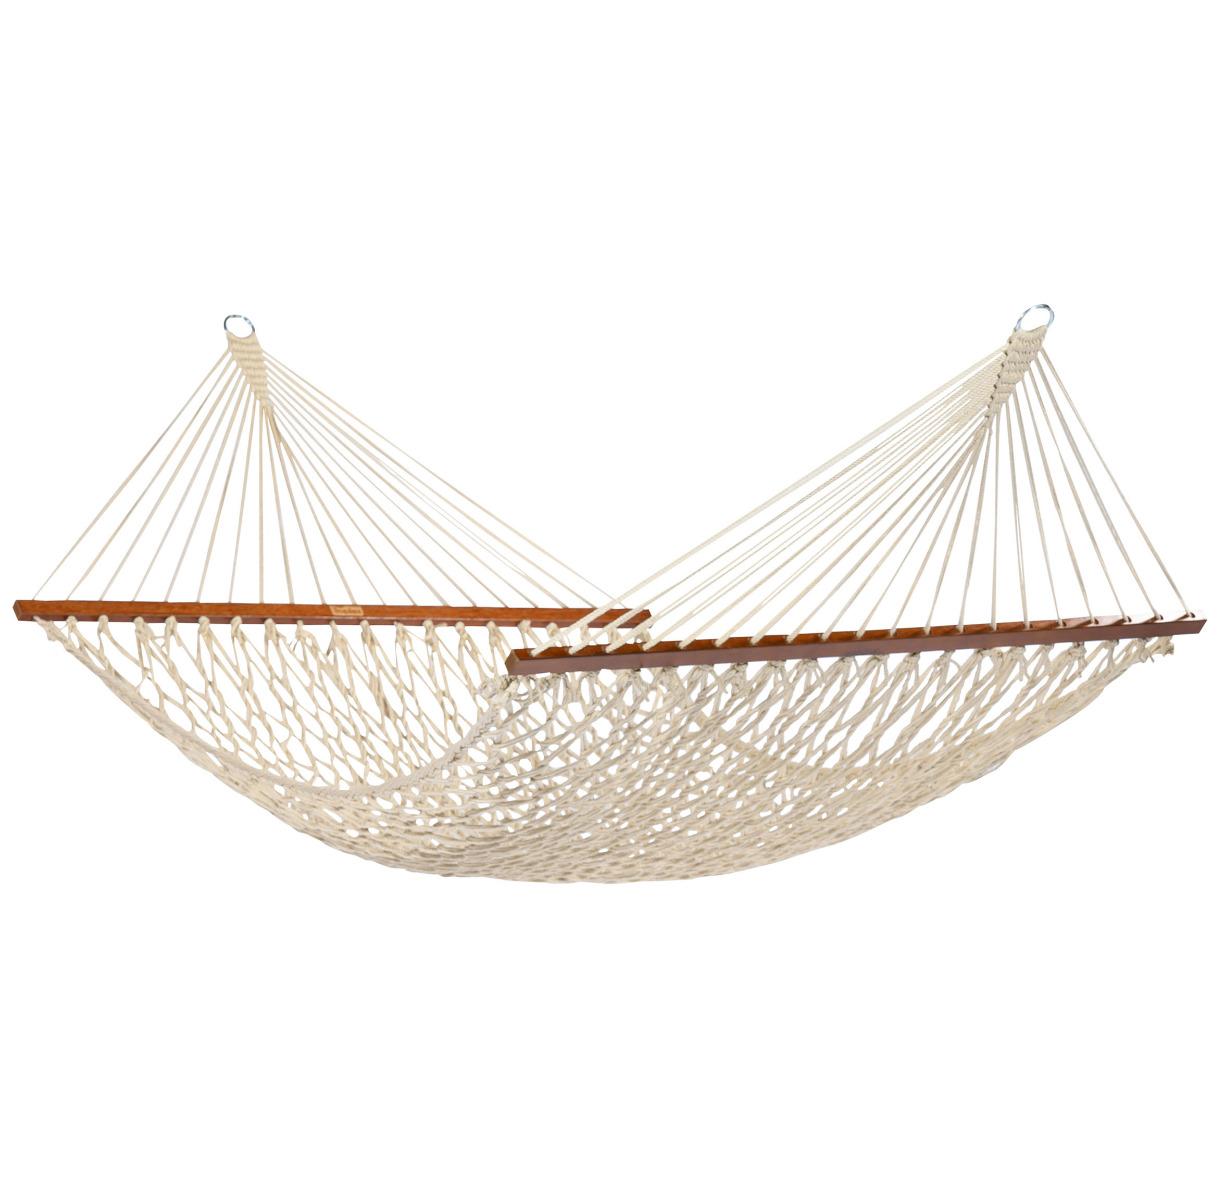 Hangmat 'Rope' Natura - Tropilex �